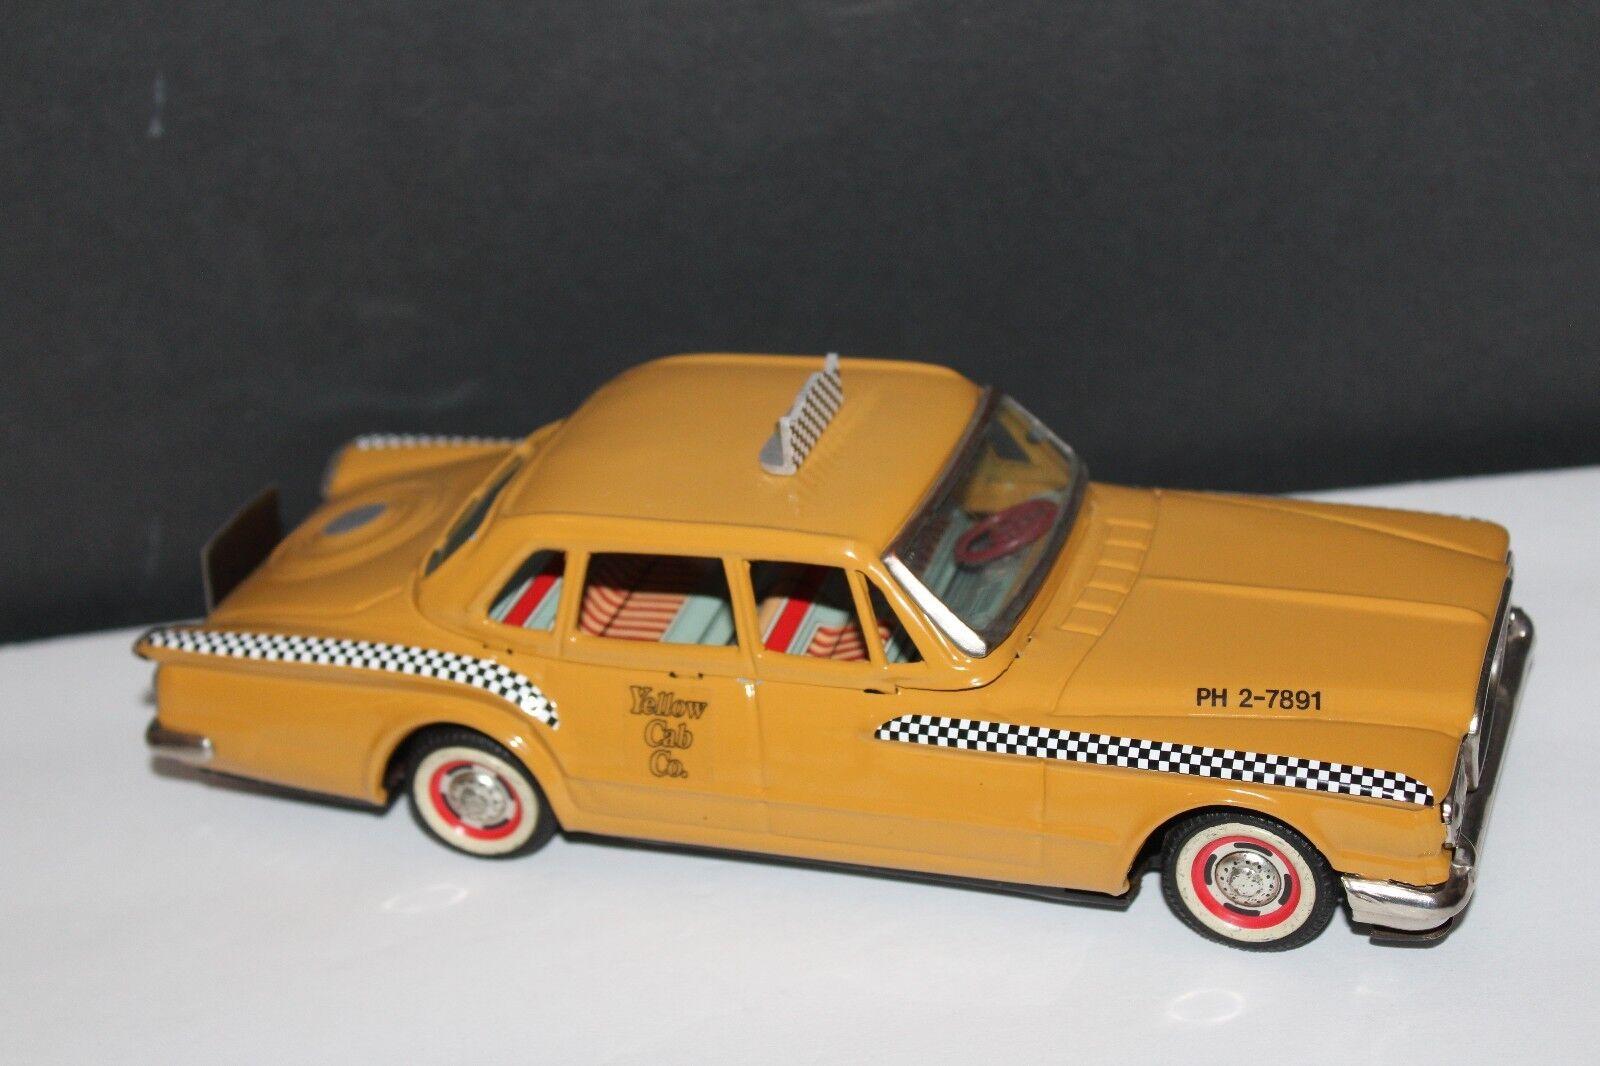 Muy Bonito Caja Metálica Fricción a Medida Yonezawa 1961 Plymouth Valiant